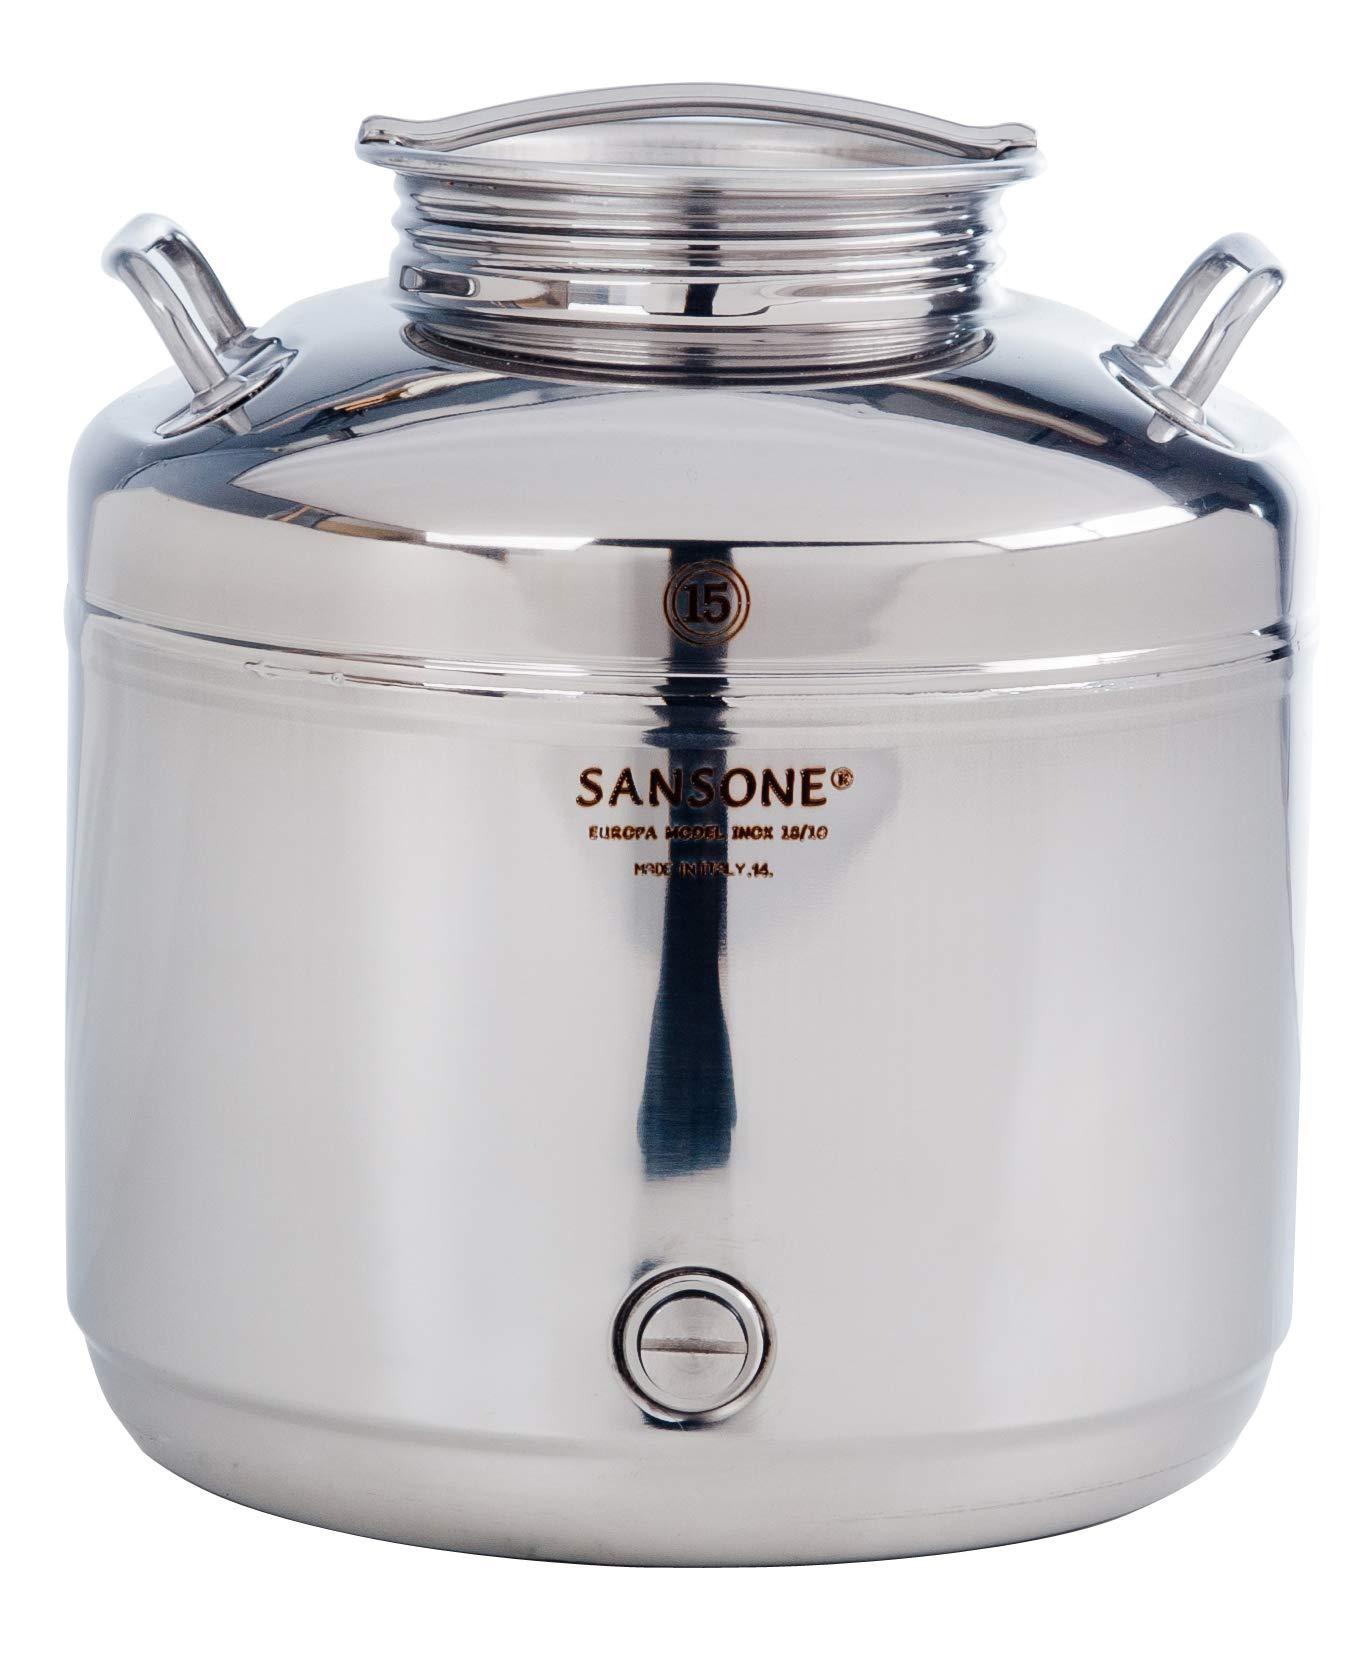 Sansone NSF Stainless Steel Water Dispenser with Spigot, 3.96 gallon, 15 Liters, Silver by Sansone